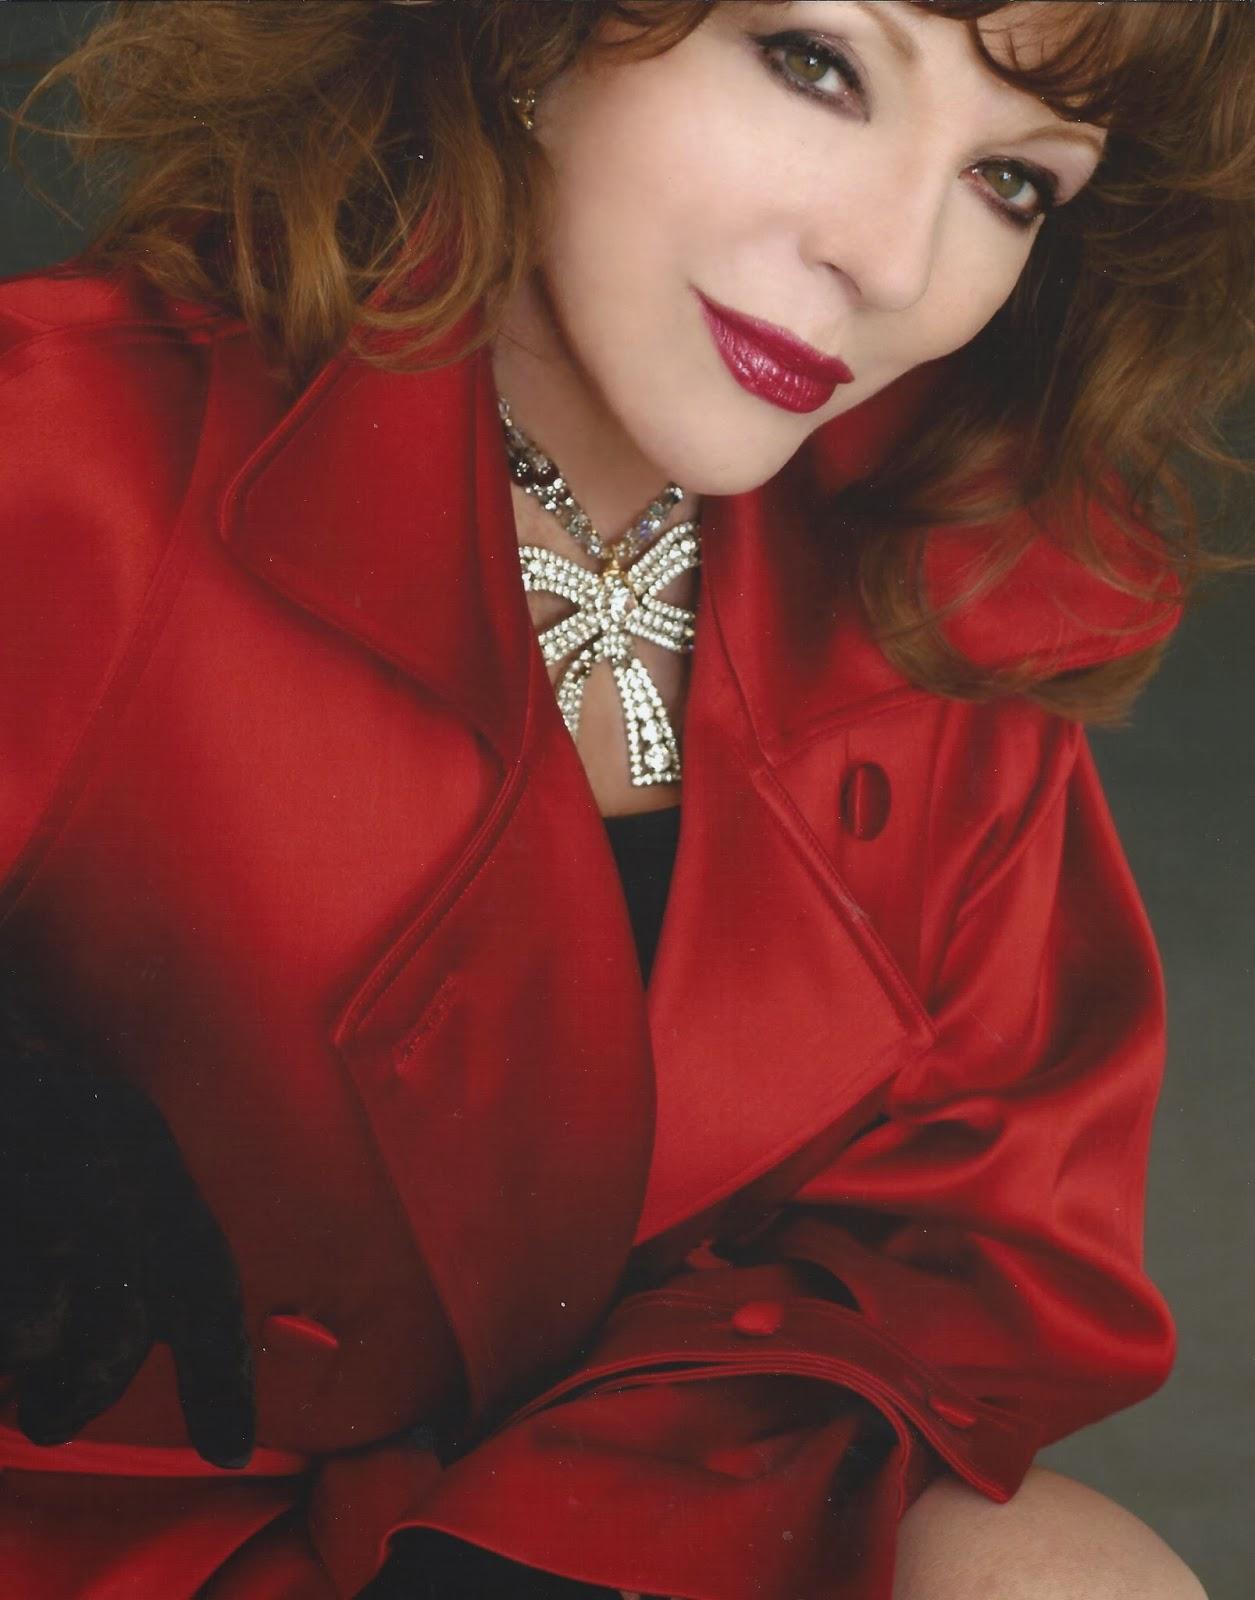 Joan looks sensationally super in this stunning promo shot